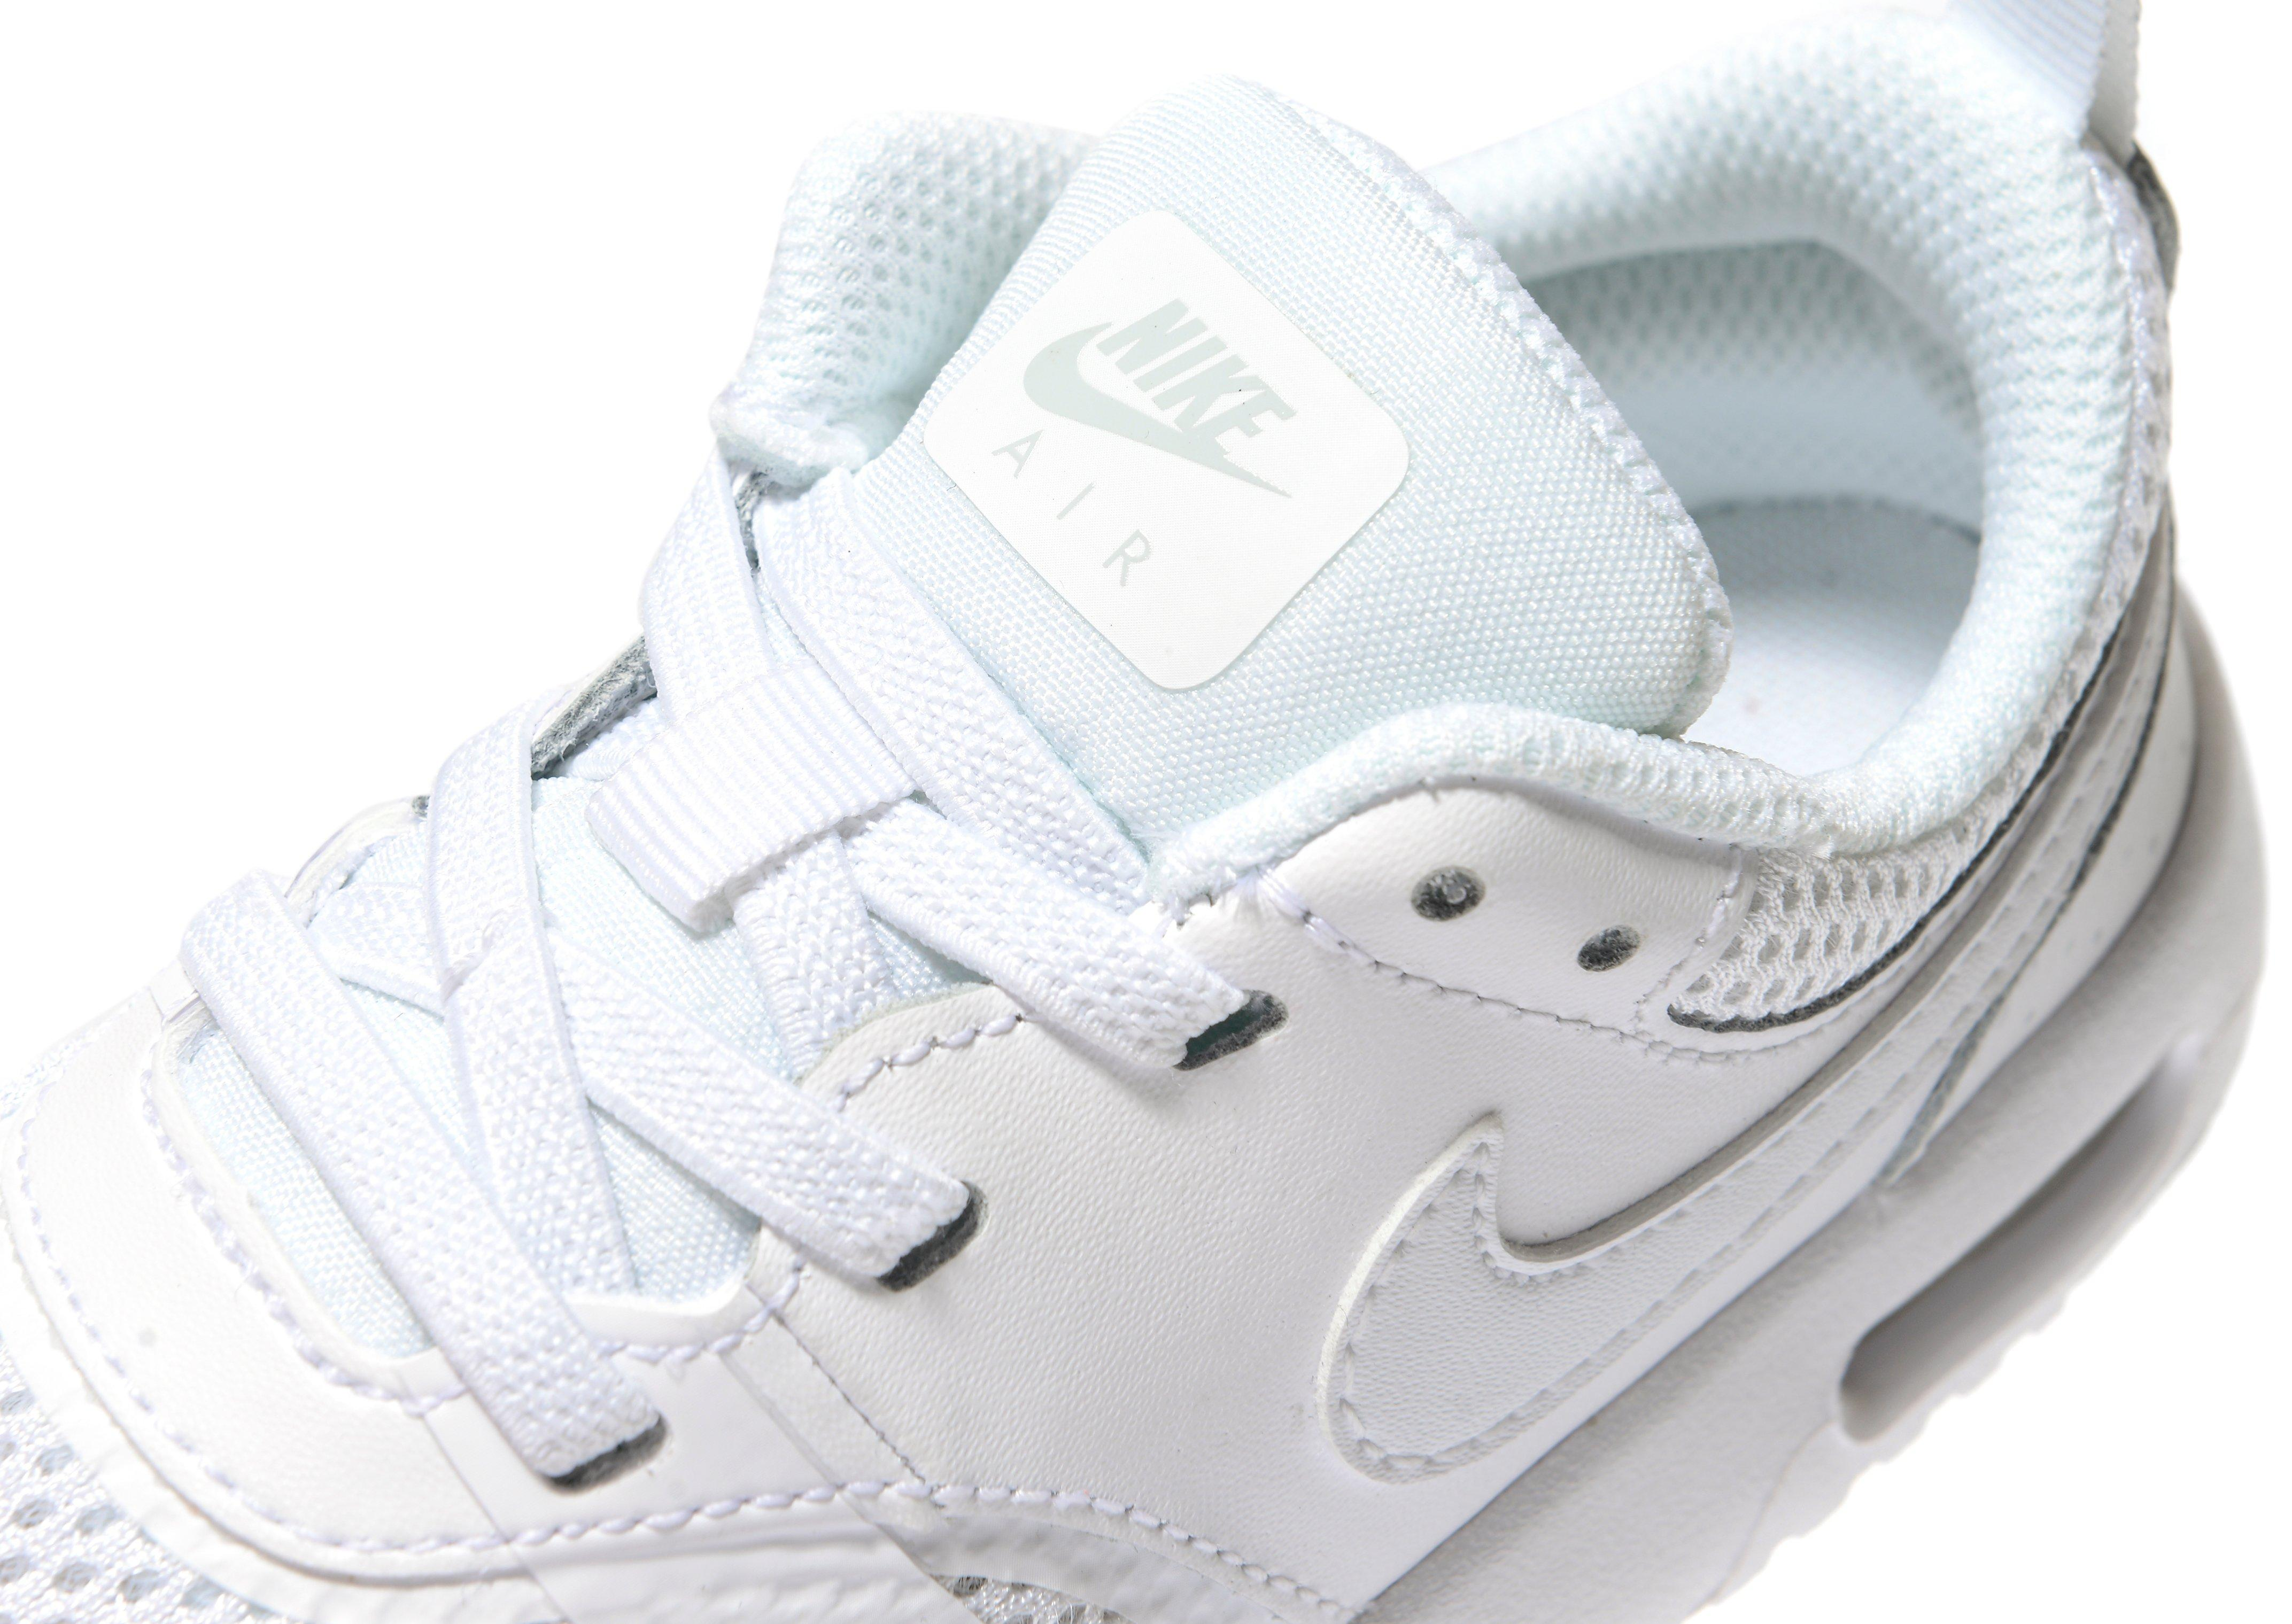 6a7720c42ac8 Olive Nike Sock Dart Sp Usa